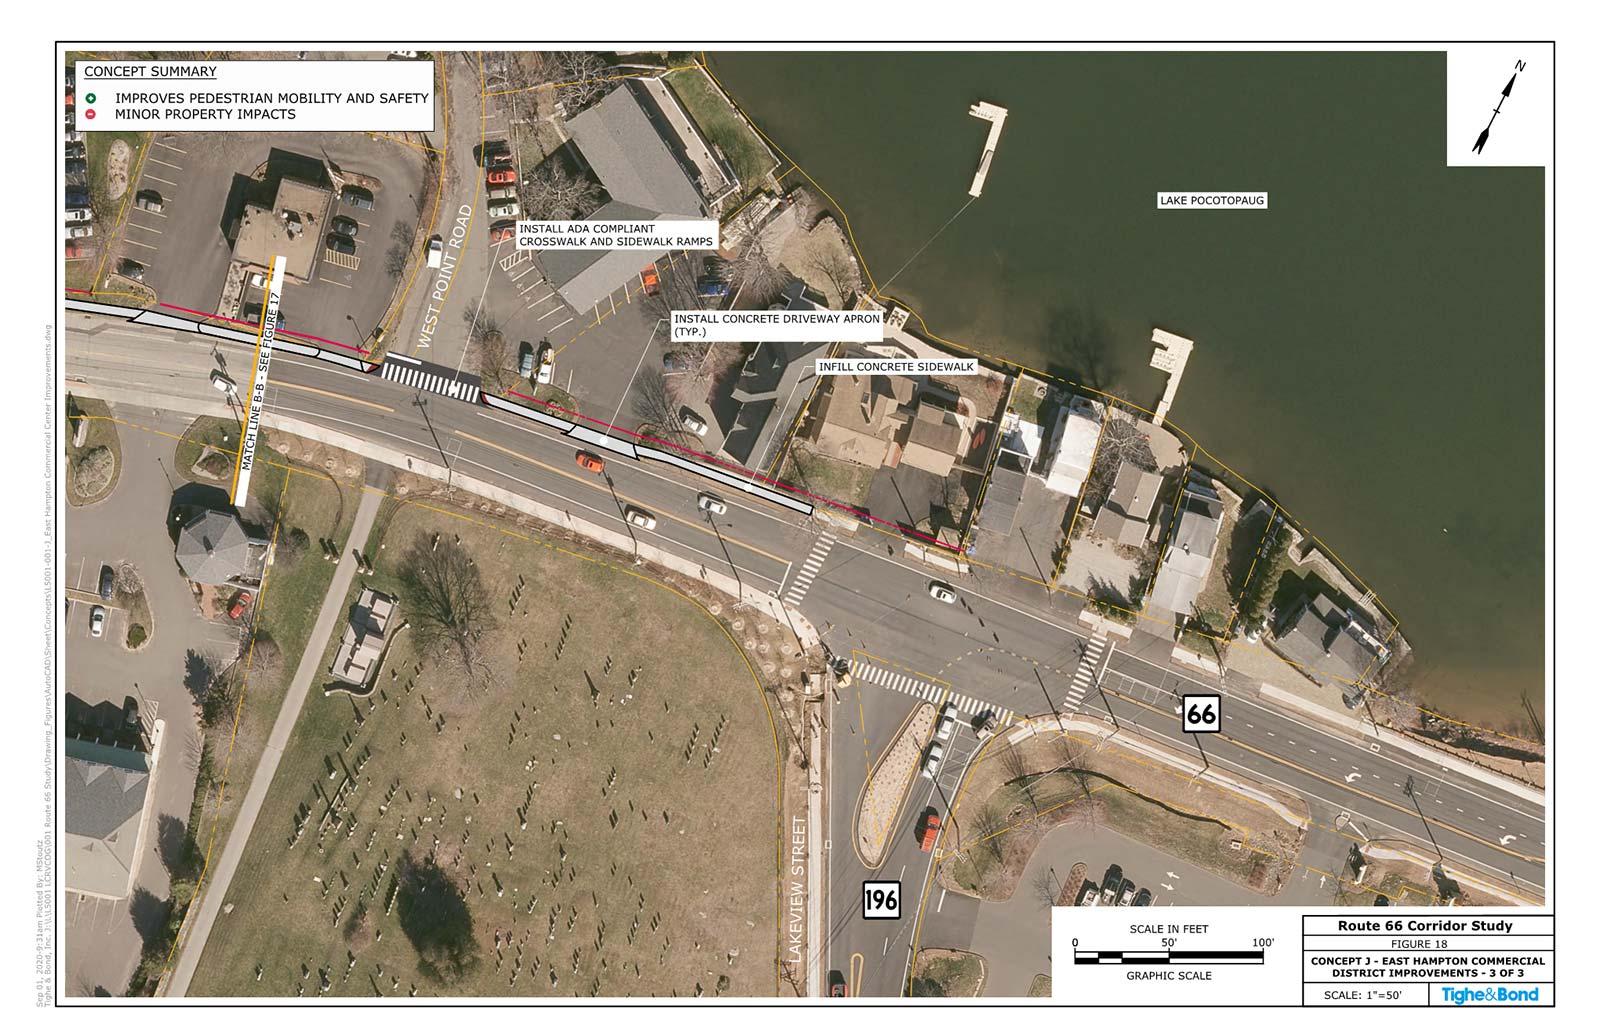 Route 66 at East Hampton Commercial District Improvements (Concept J). Route 66 Transportation Study, Portland and East Hampton, CT.